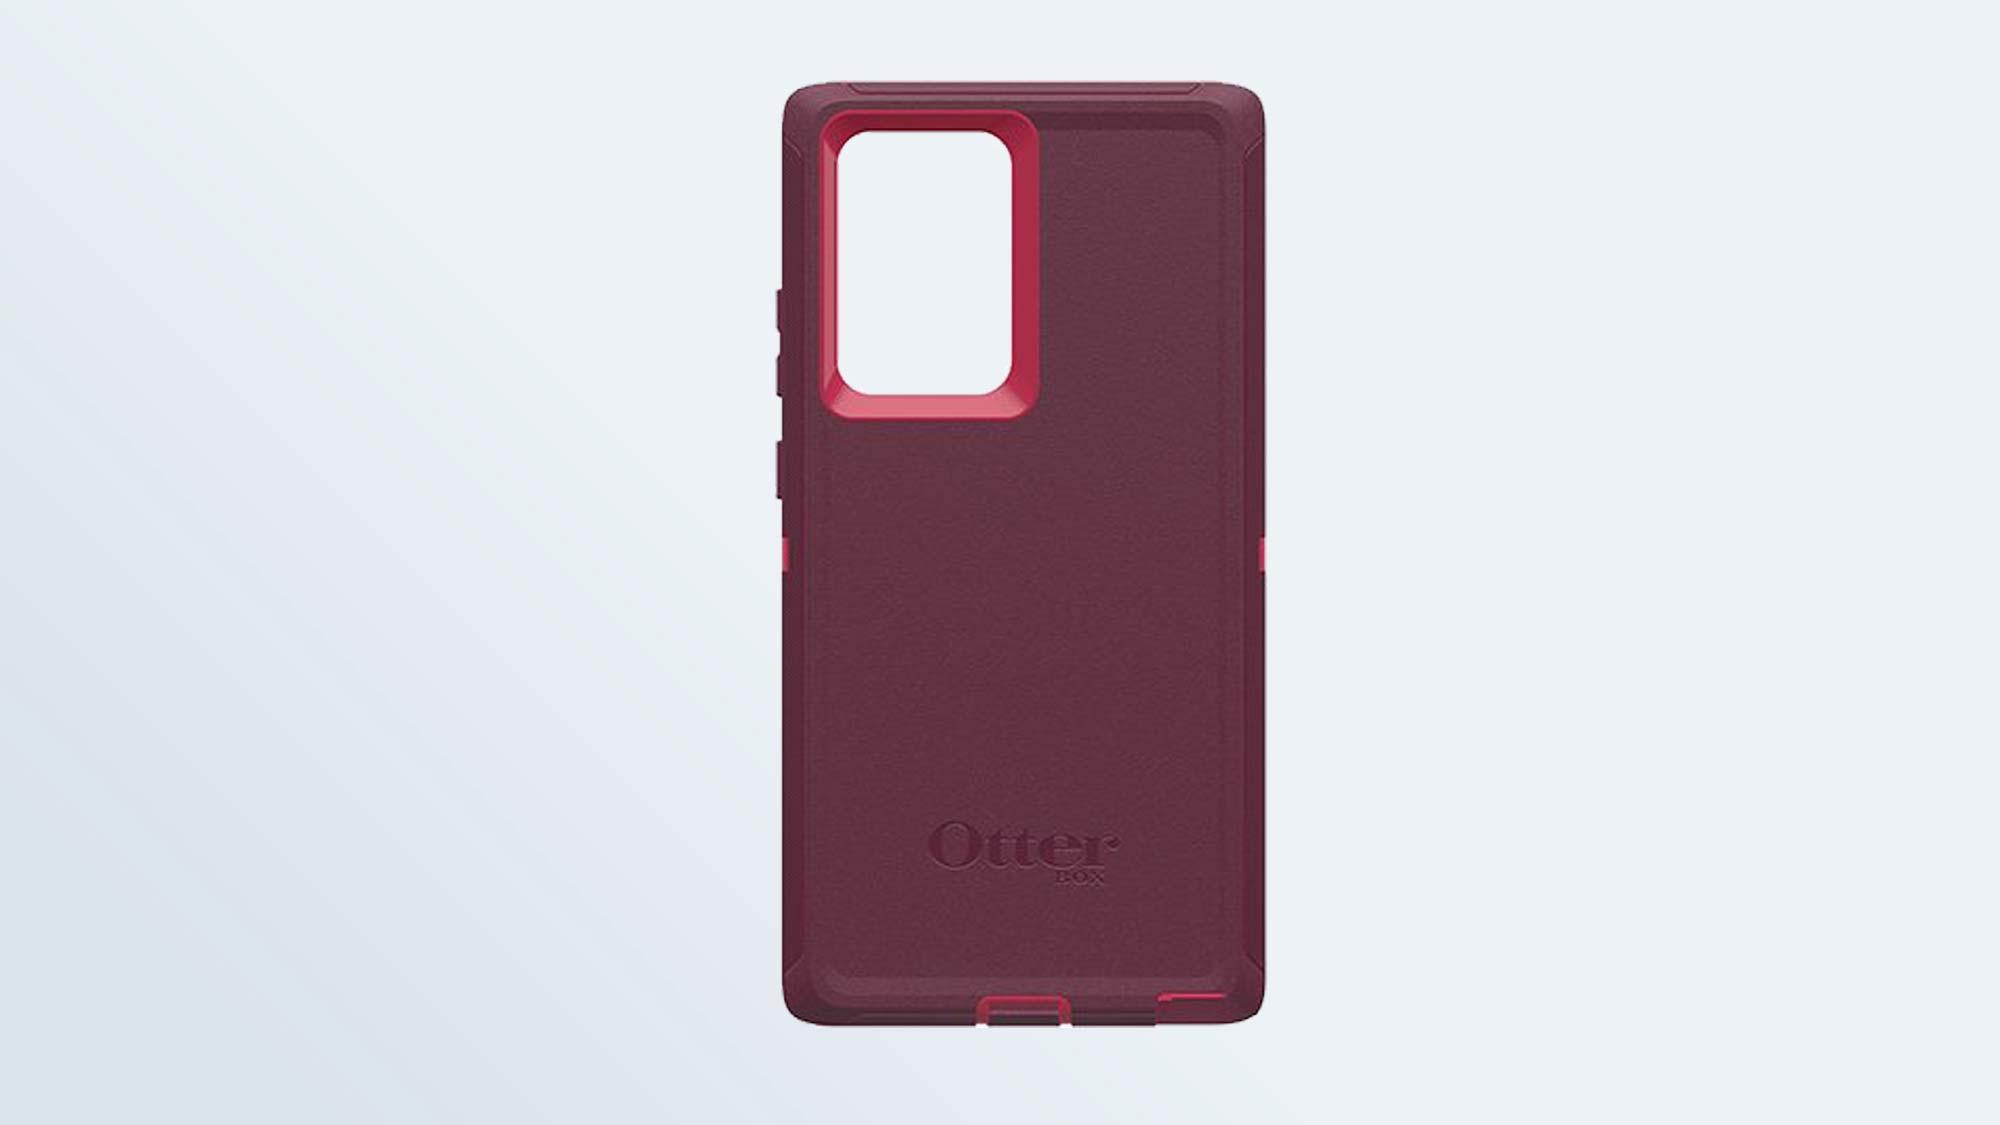 Лучшие чехлы для Samsung Galaxy Note 20 Ultra: чехол Otterbox Defender Pro Series для Galaxy Note 20 Ultra